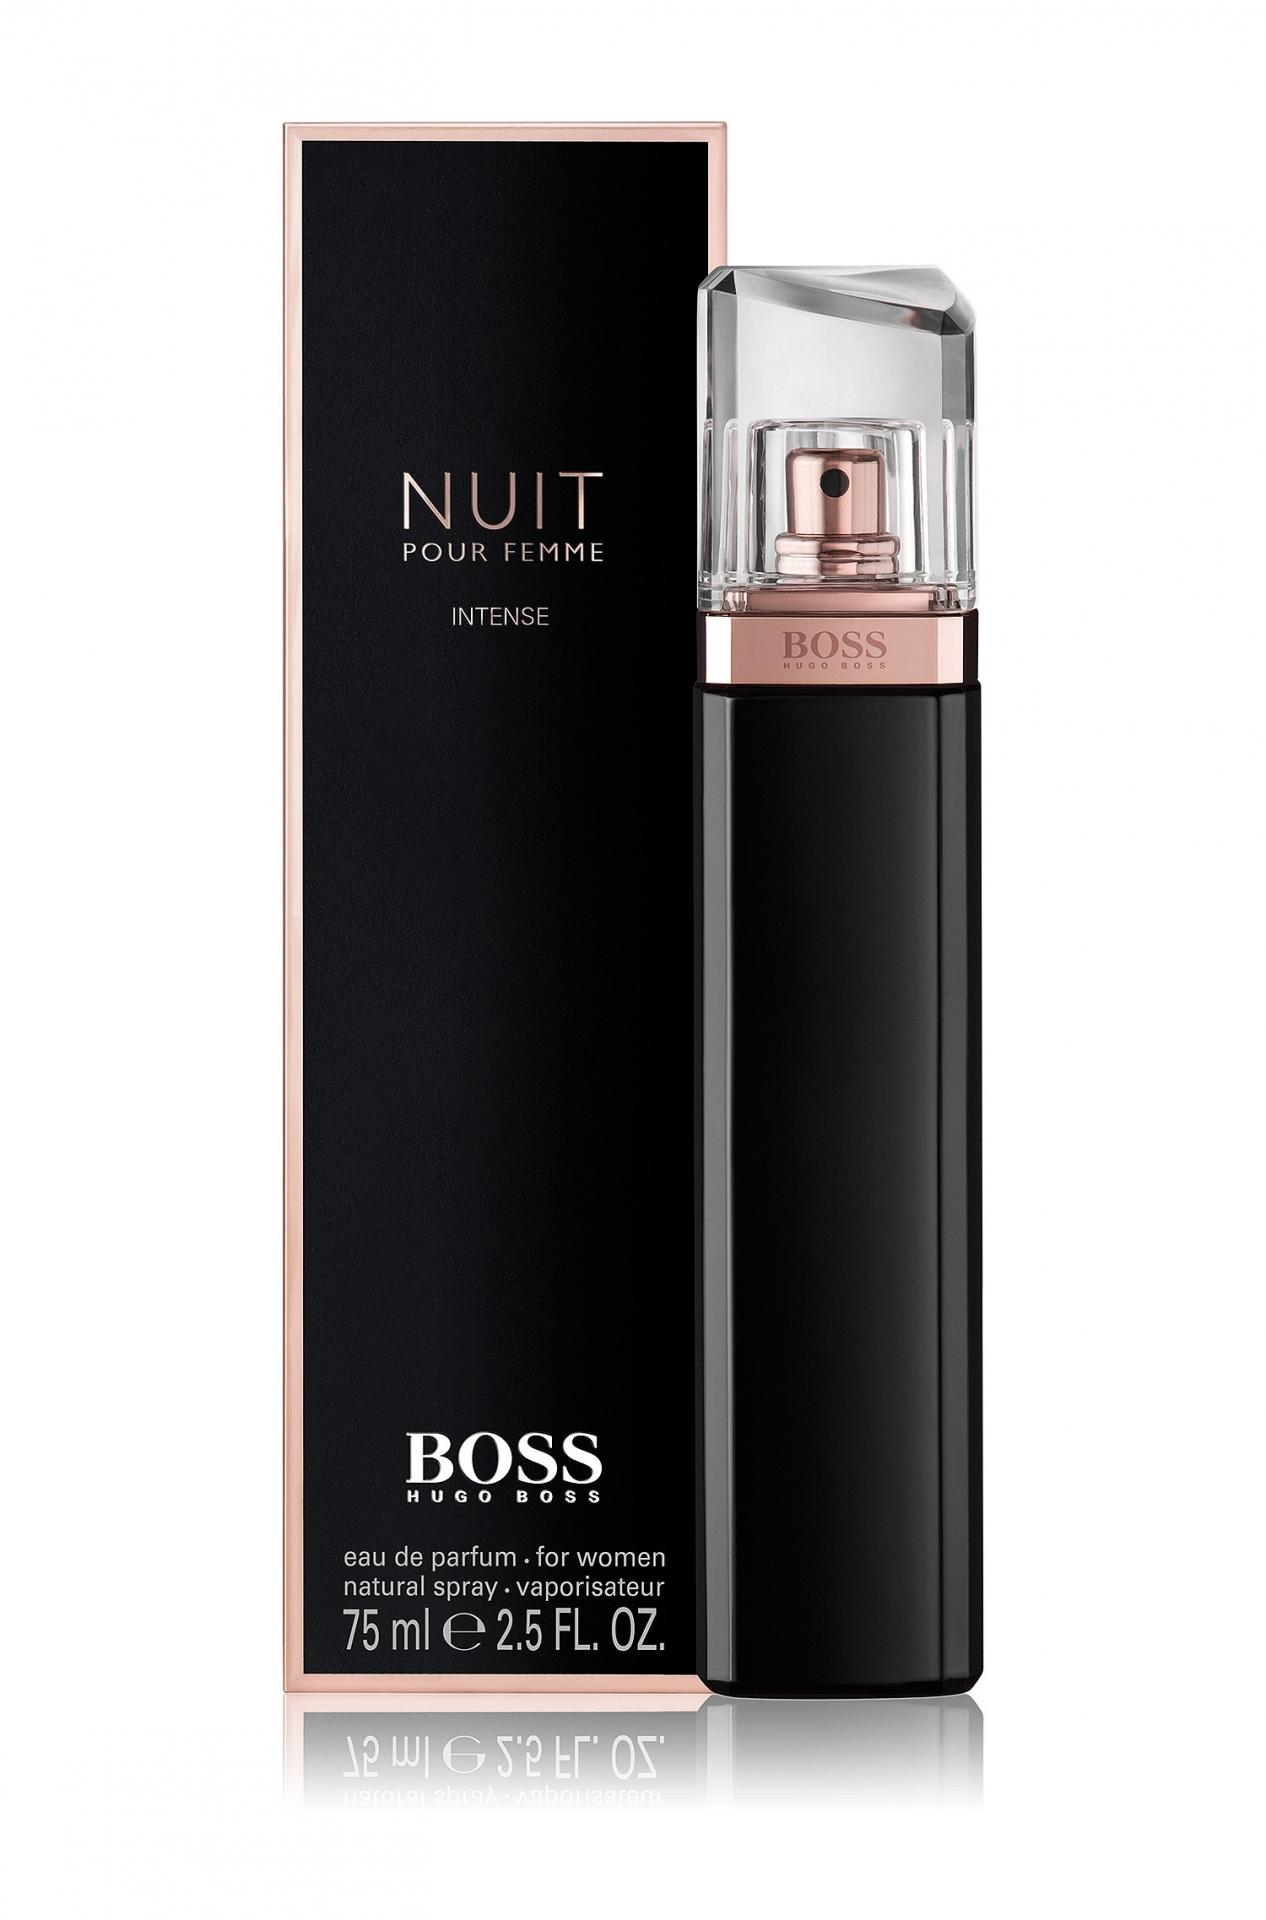 Hugo Boss Nuit Intense Eau De Parfum 75 ml